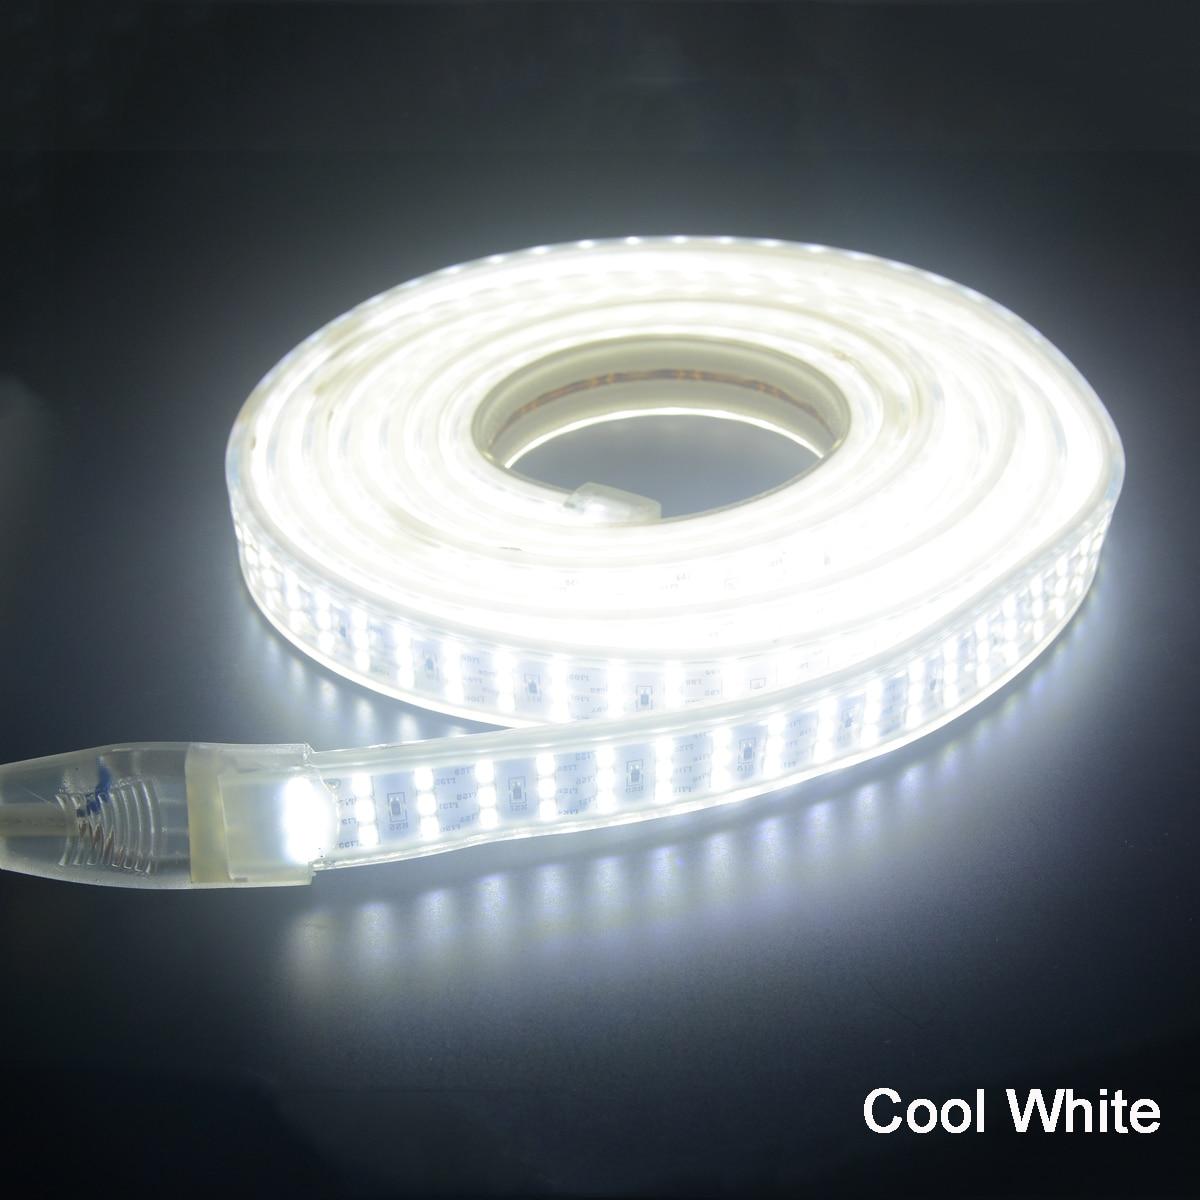 Led ストリップライト 220 12v smd 2835 柔軟なテープ 276 leds/メートル 1 メートル 2 メートル 4 メートル 5 メートル 6 メートル 7 メートル 8 メートル 9 メートル + 電源 EU プラグ